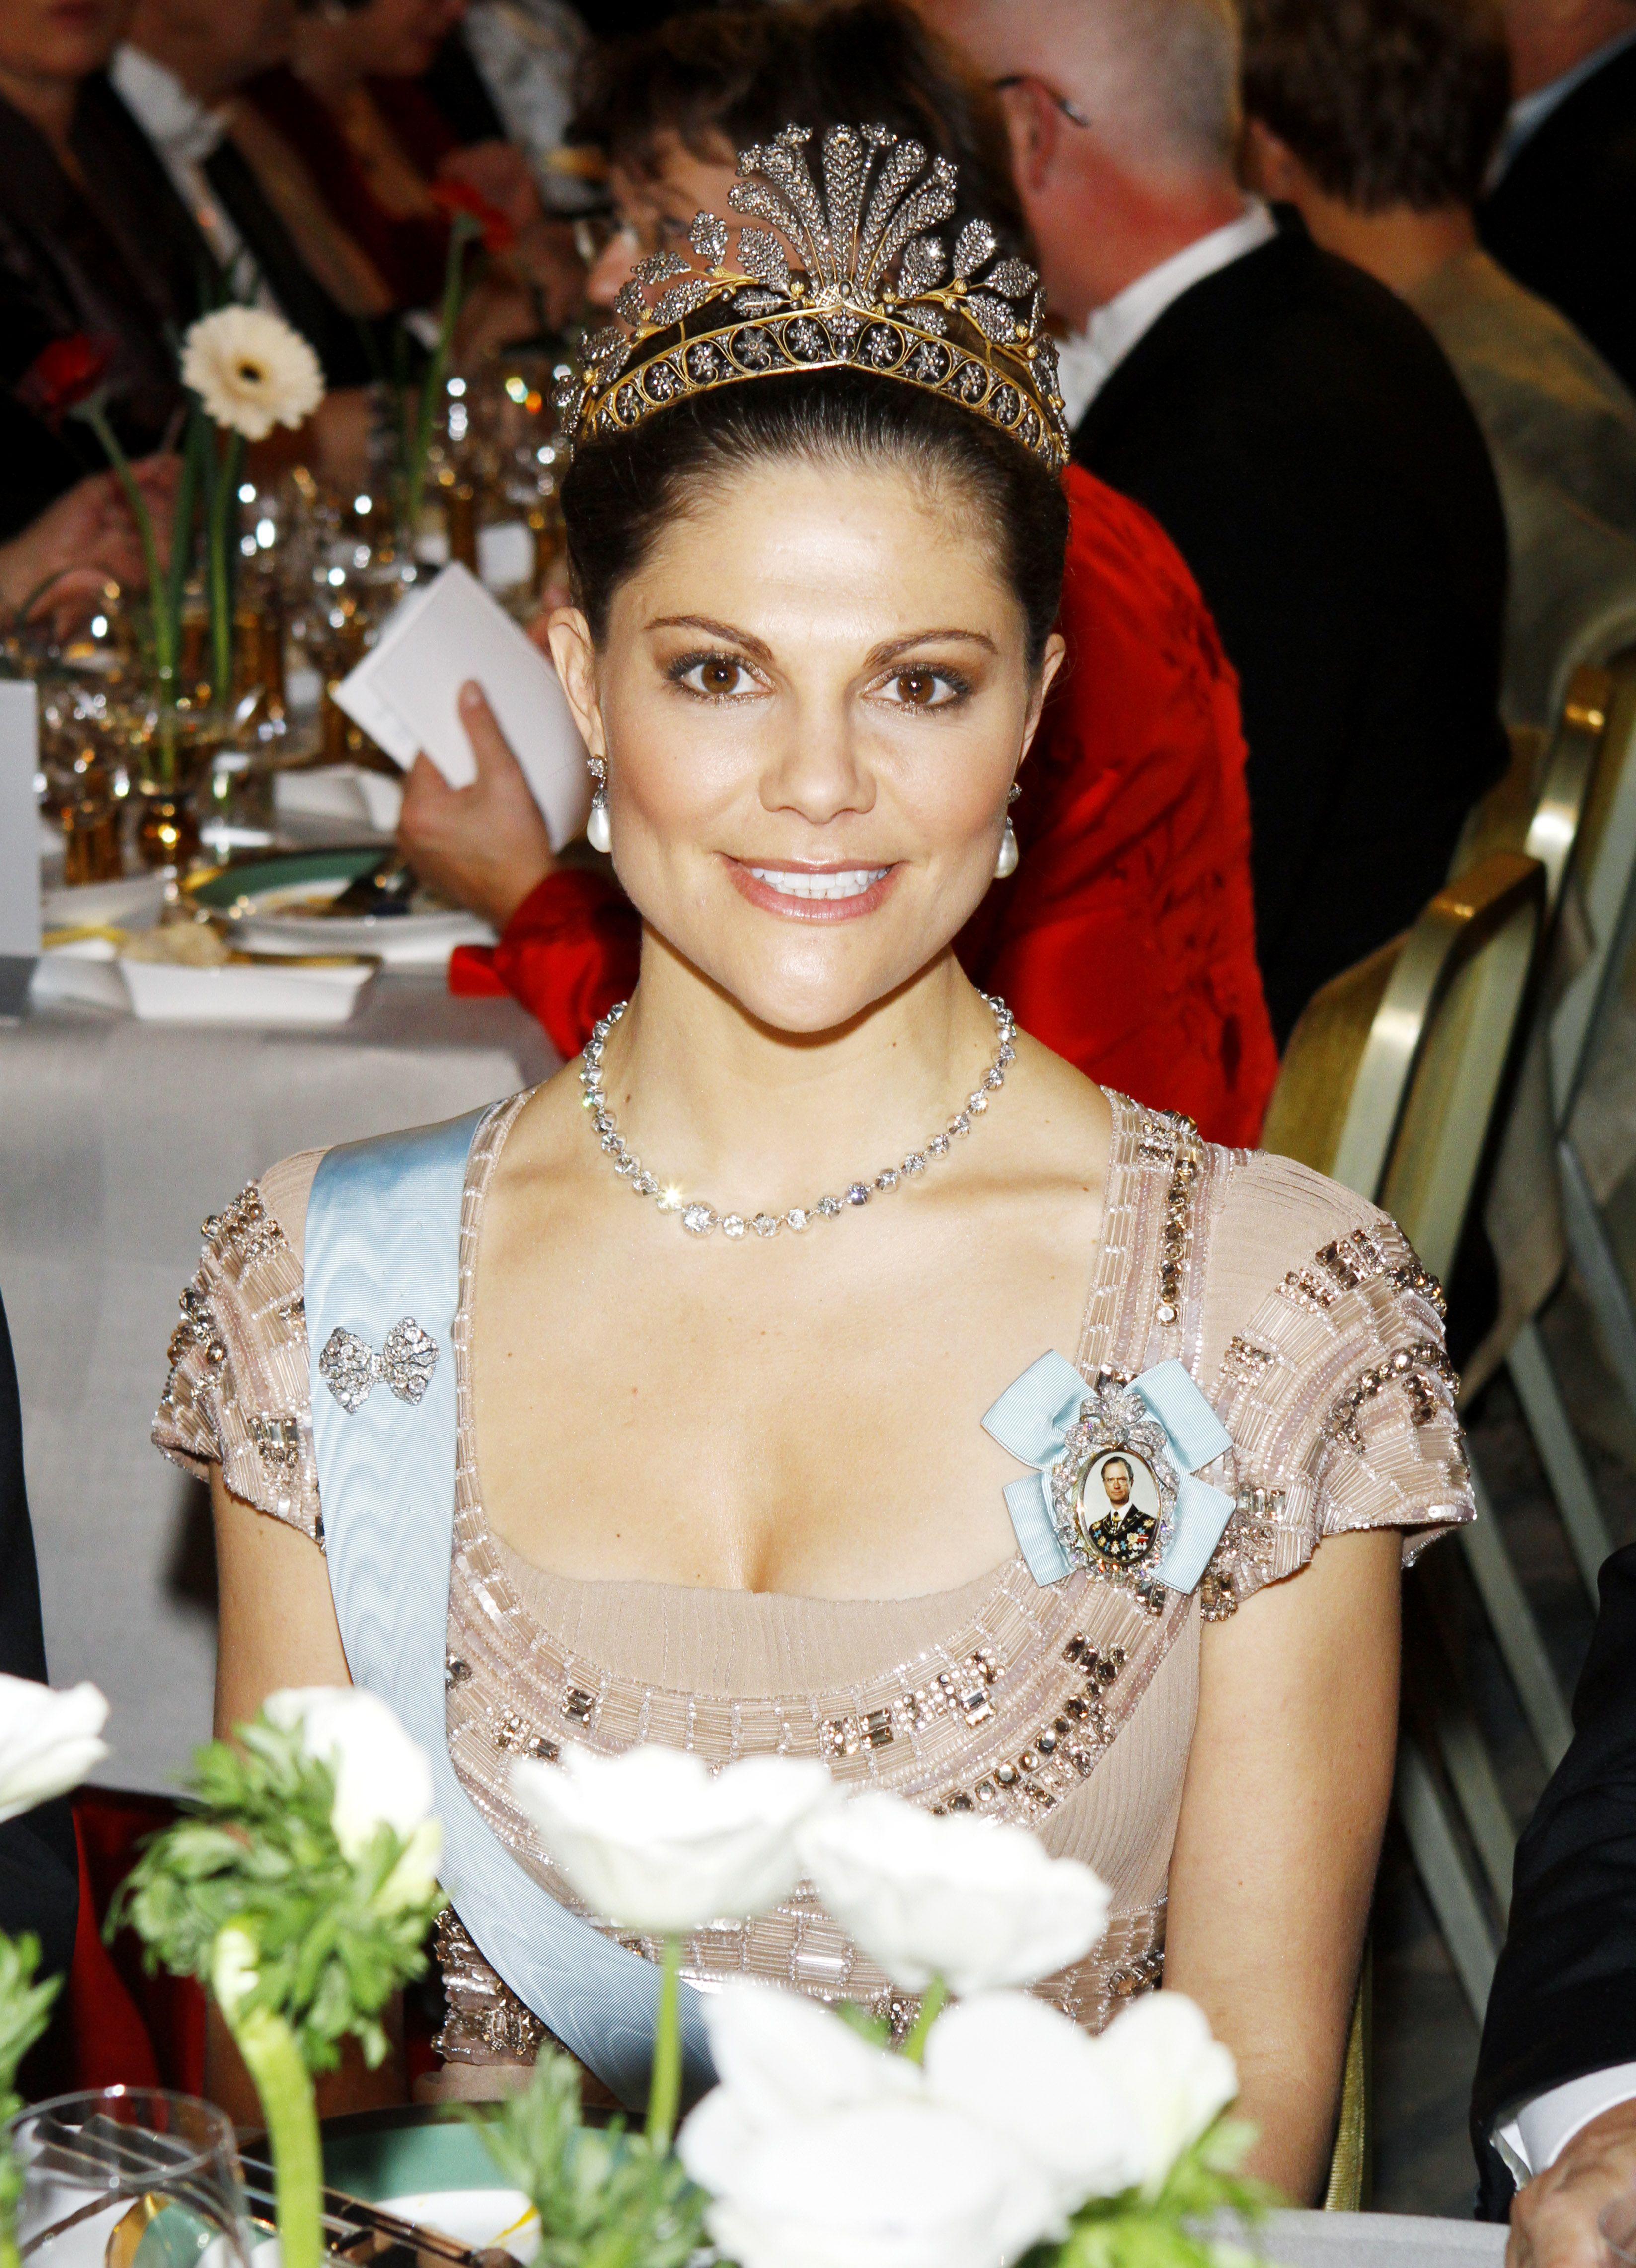 Swedish Crown Braid Tutorial: Future Queen Of Sweden, Crown Princess Victoria